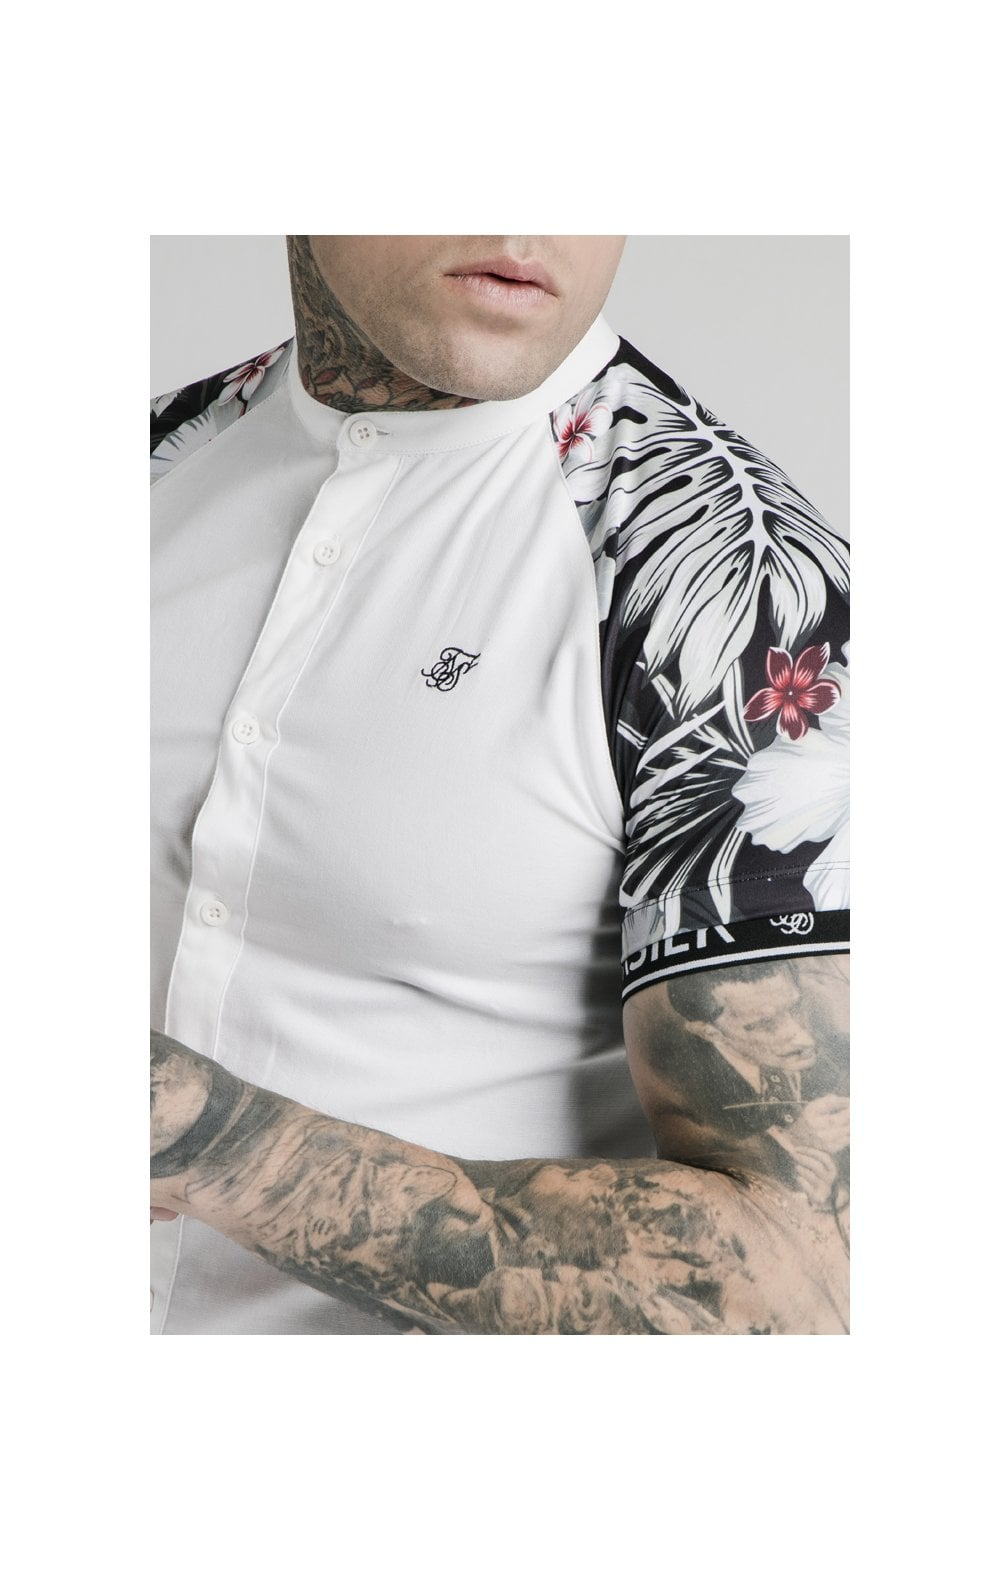 SikSilk S/S Floral Raglan Tech Shirt - White & Floral MEN SIZES TOP: Medium